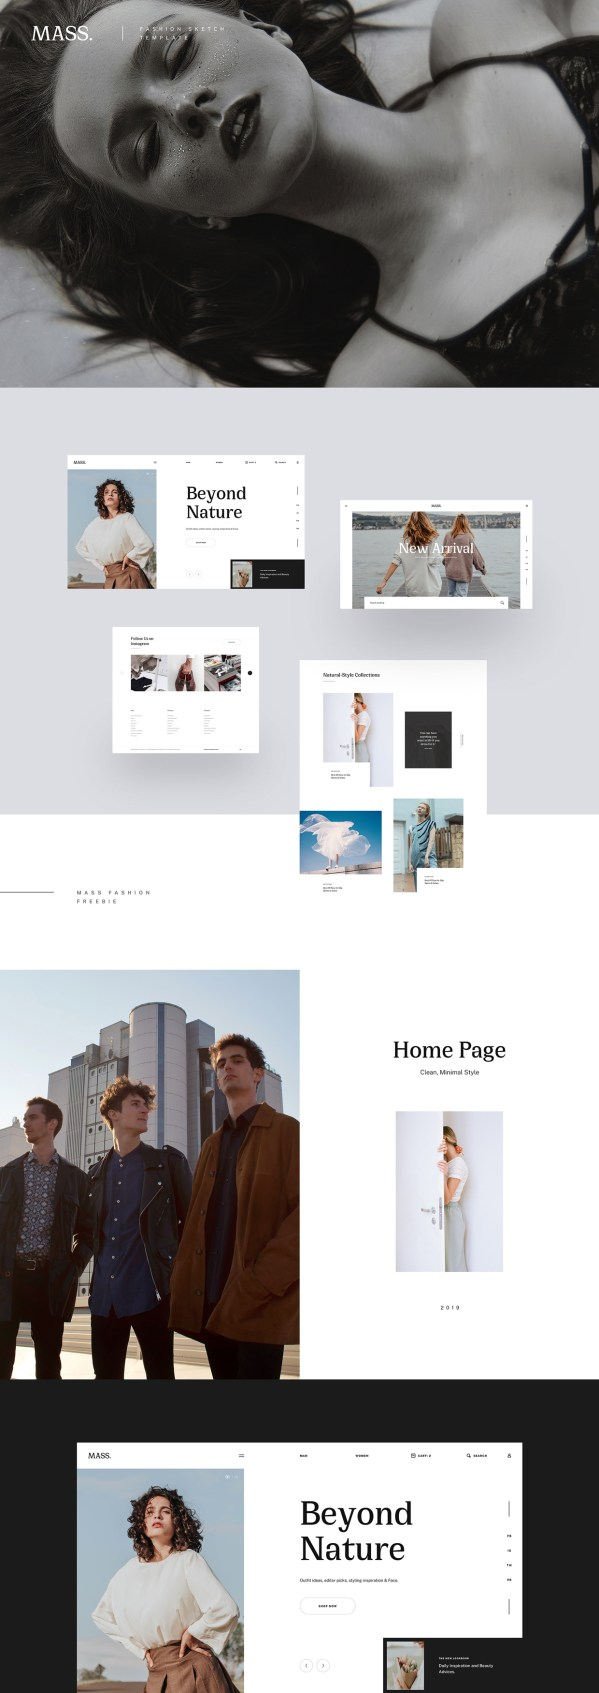 Mi Fashion - Free Website Template For Fashion Stores 02